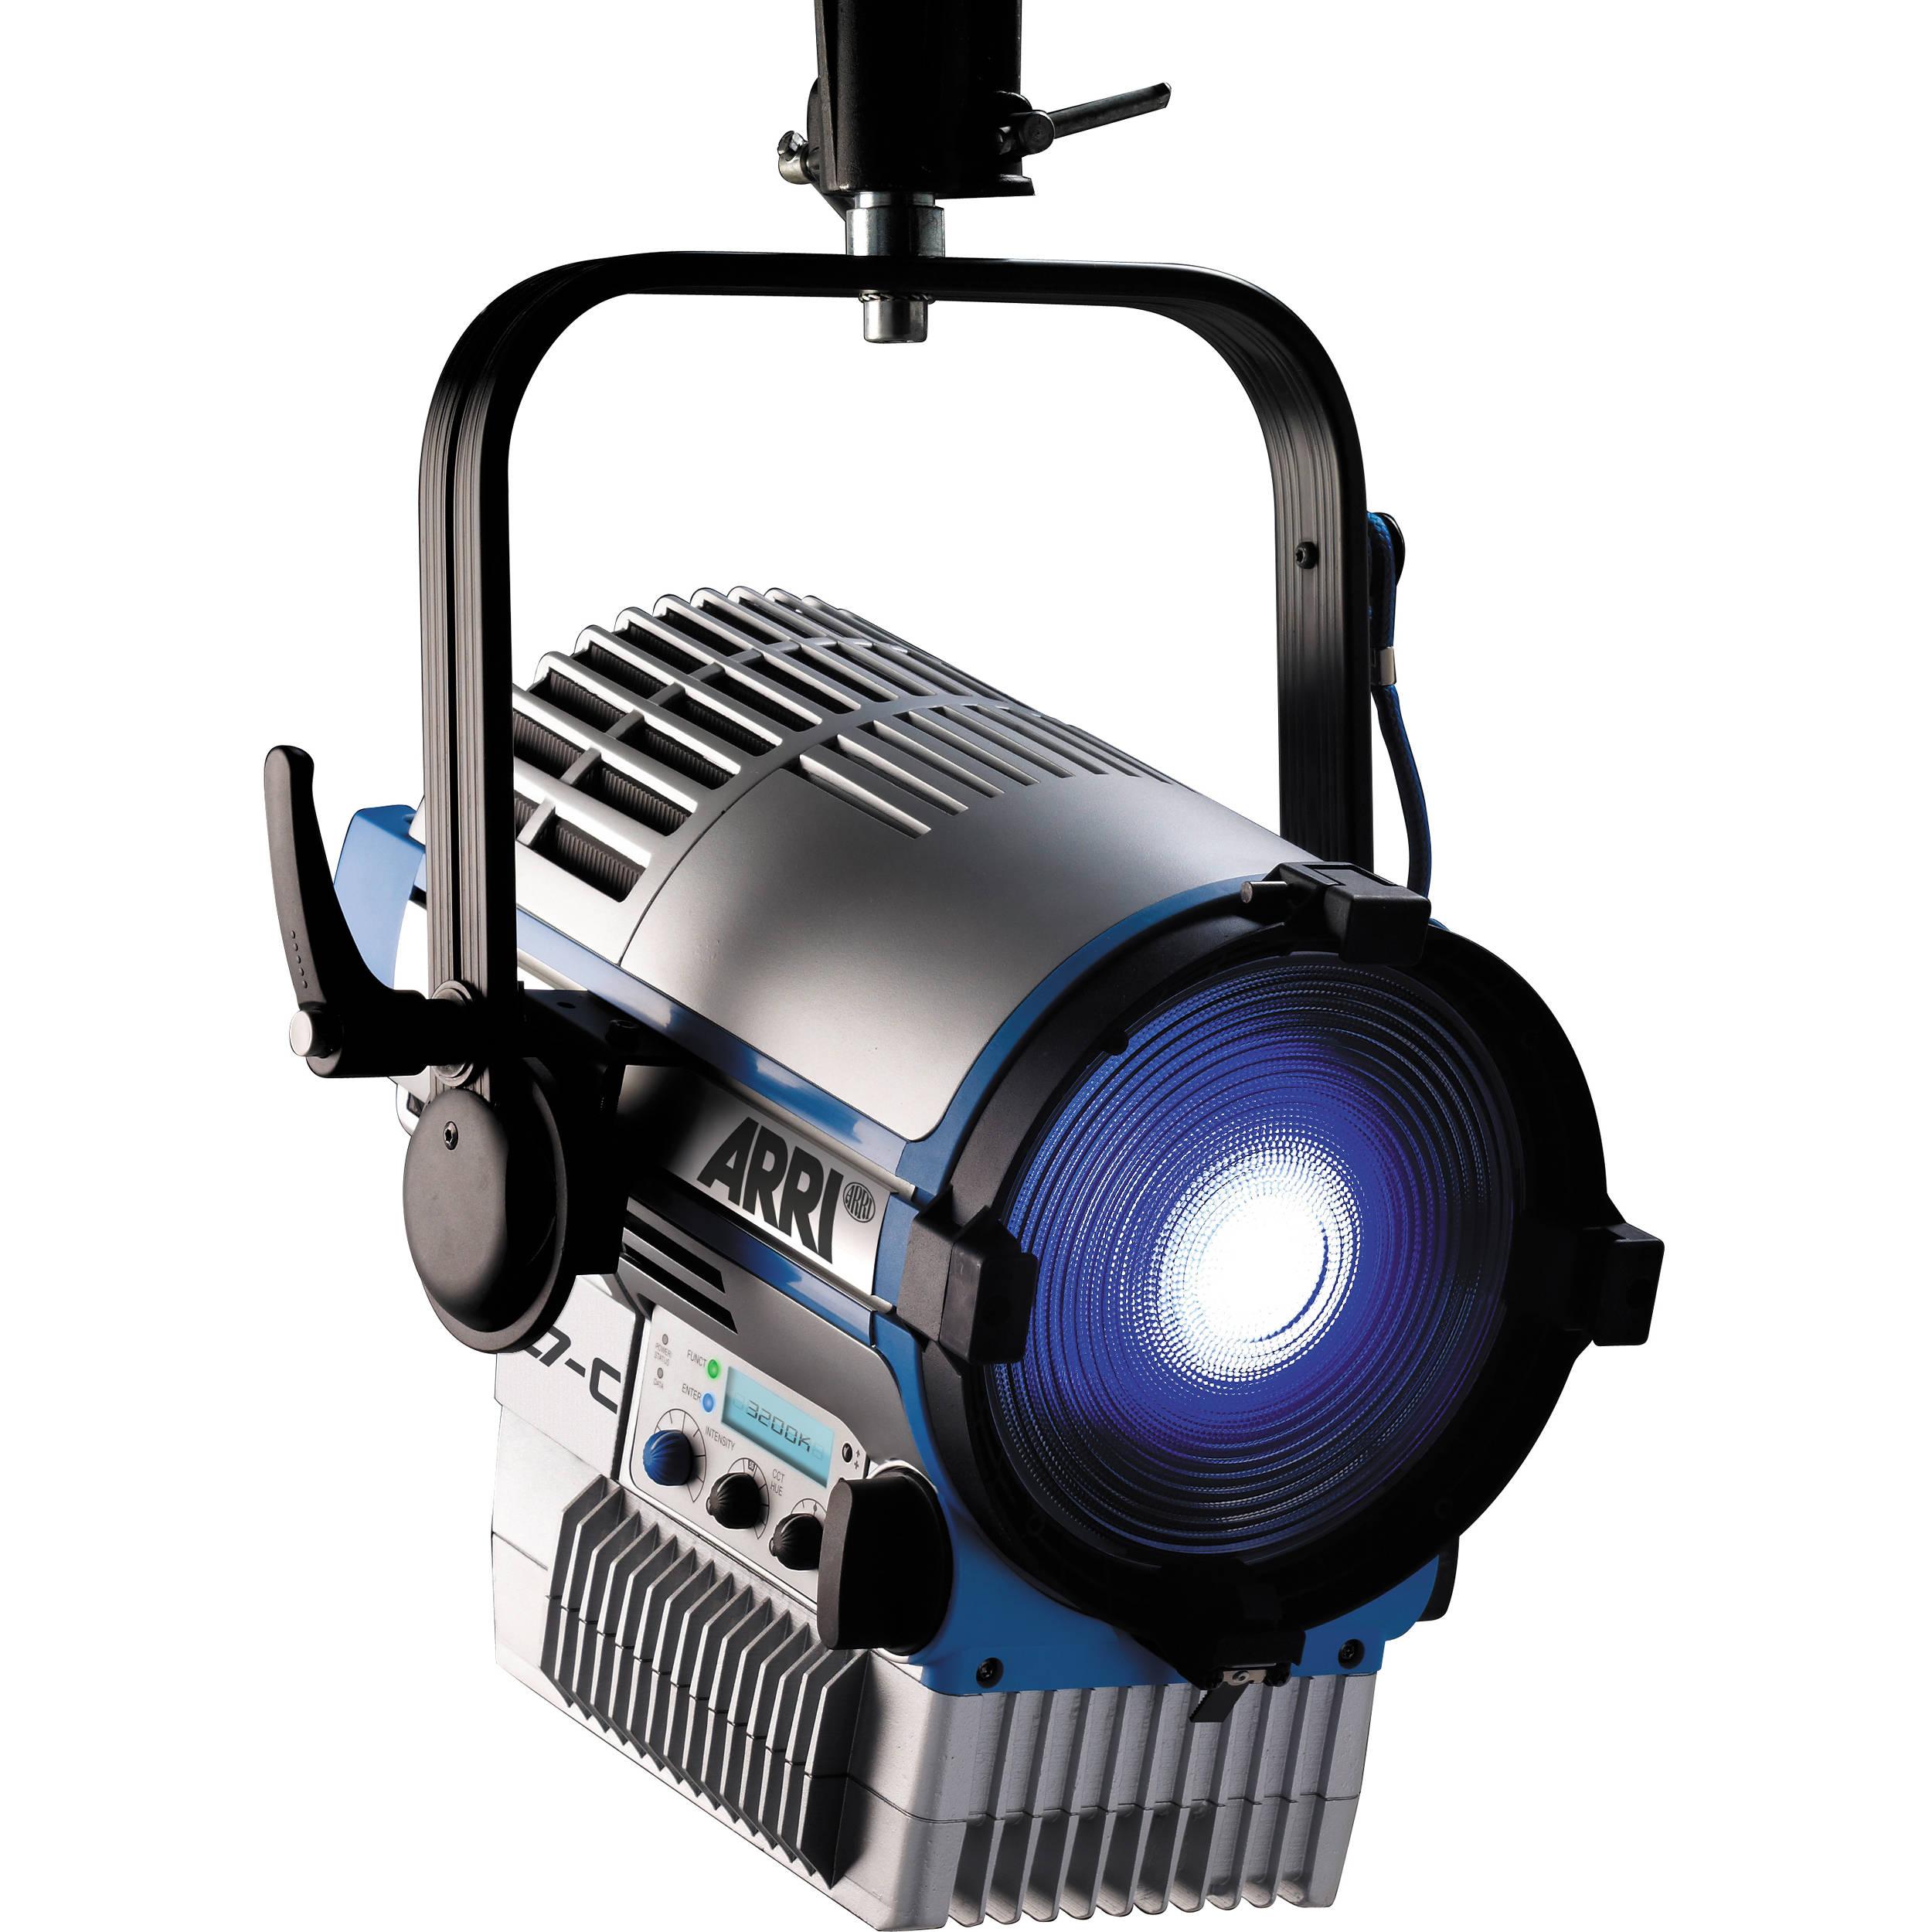 Similar model shown for illustrative purposes  sc 1 st  Bu0026H & ARRI L-7D Daylight LED Fresnel (Stand Mount) 553500D Bu0026H Photo